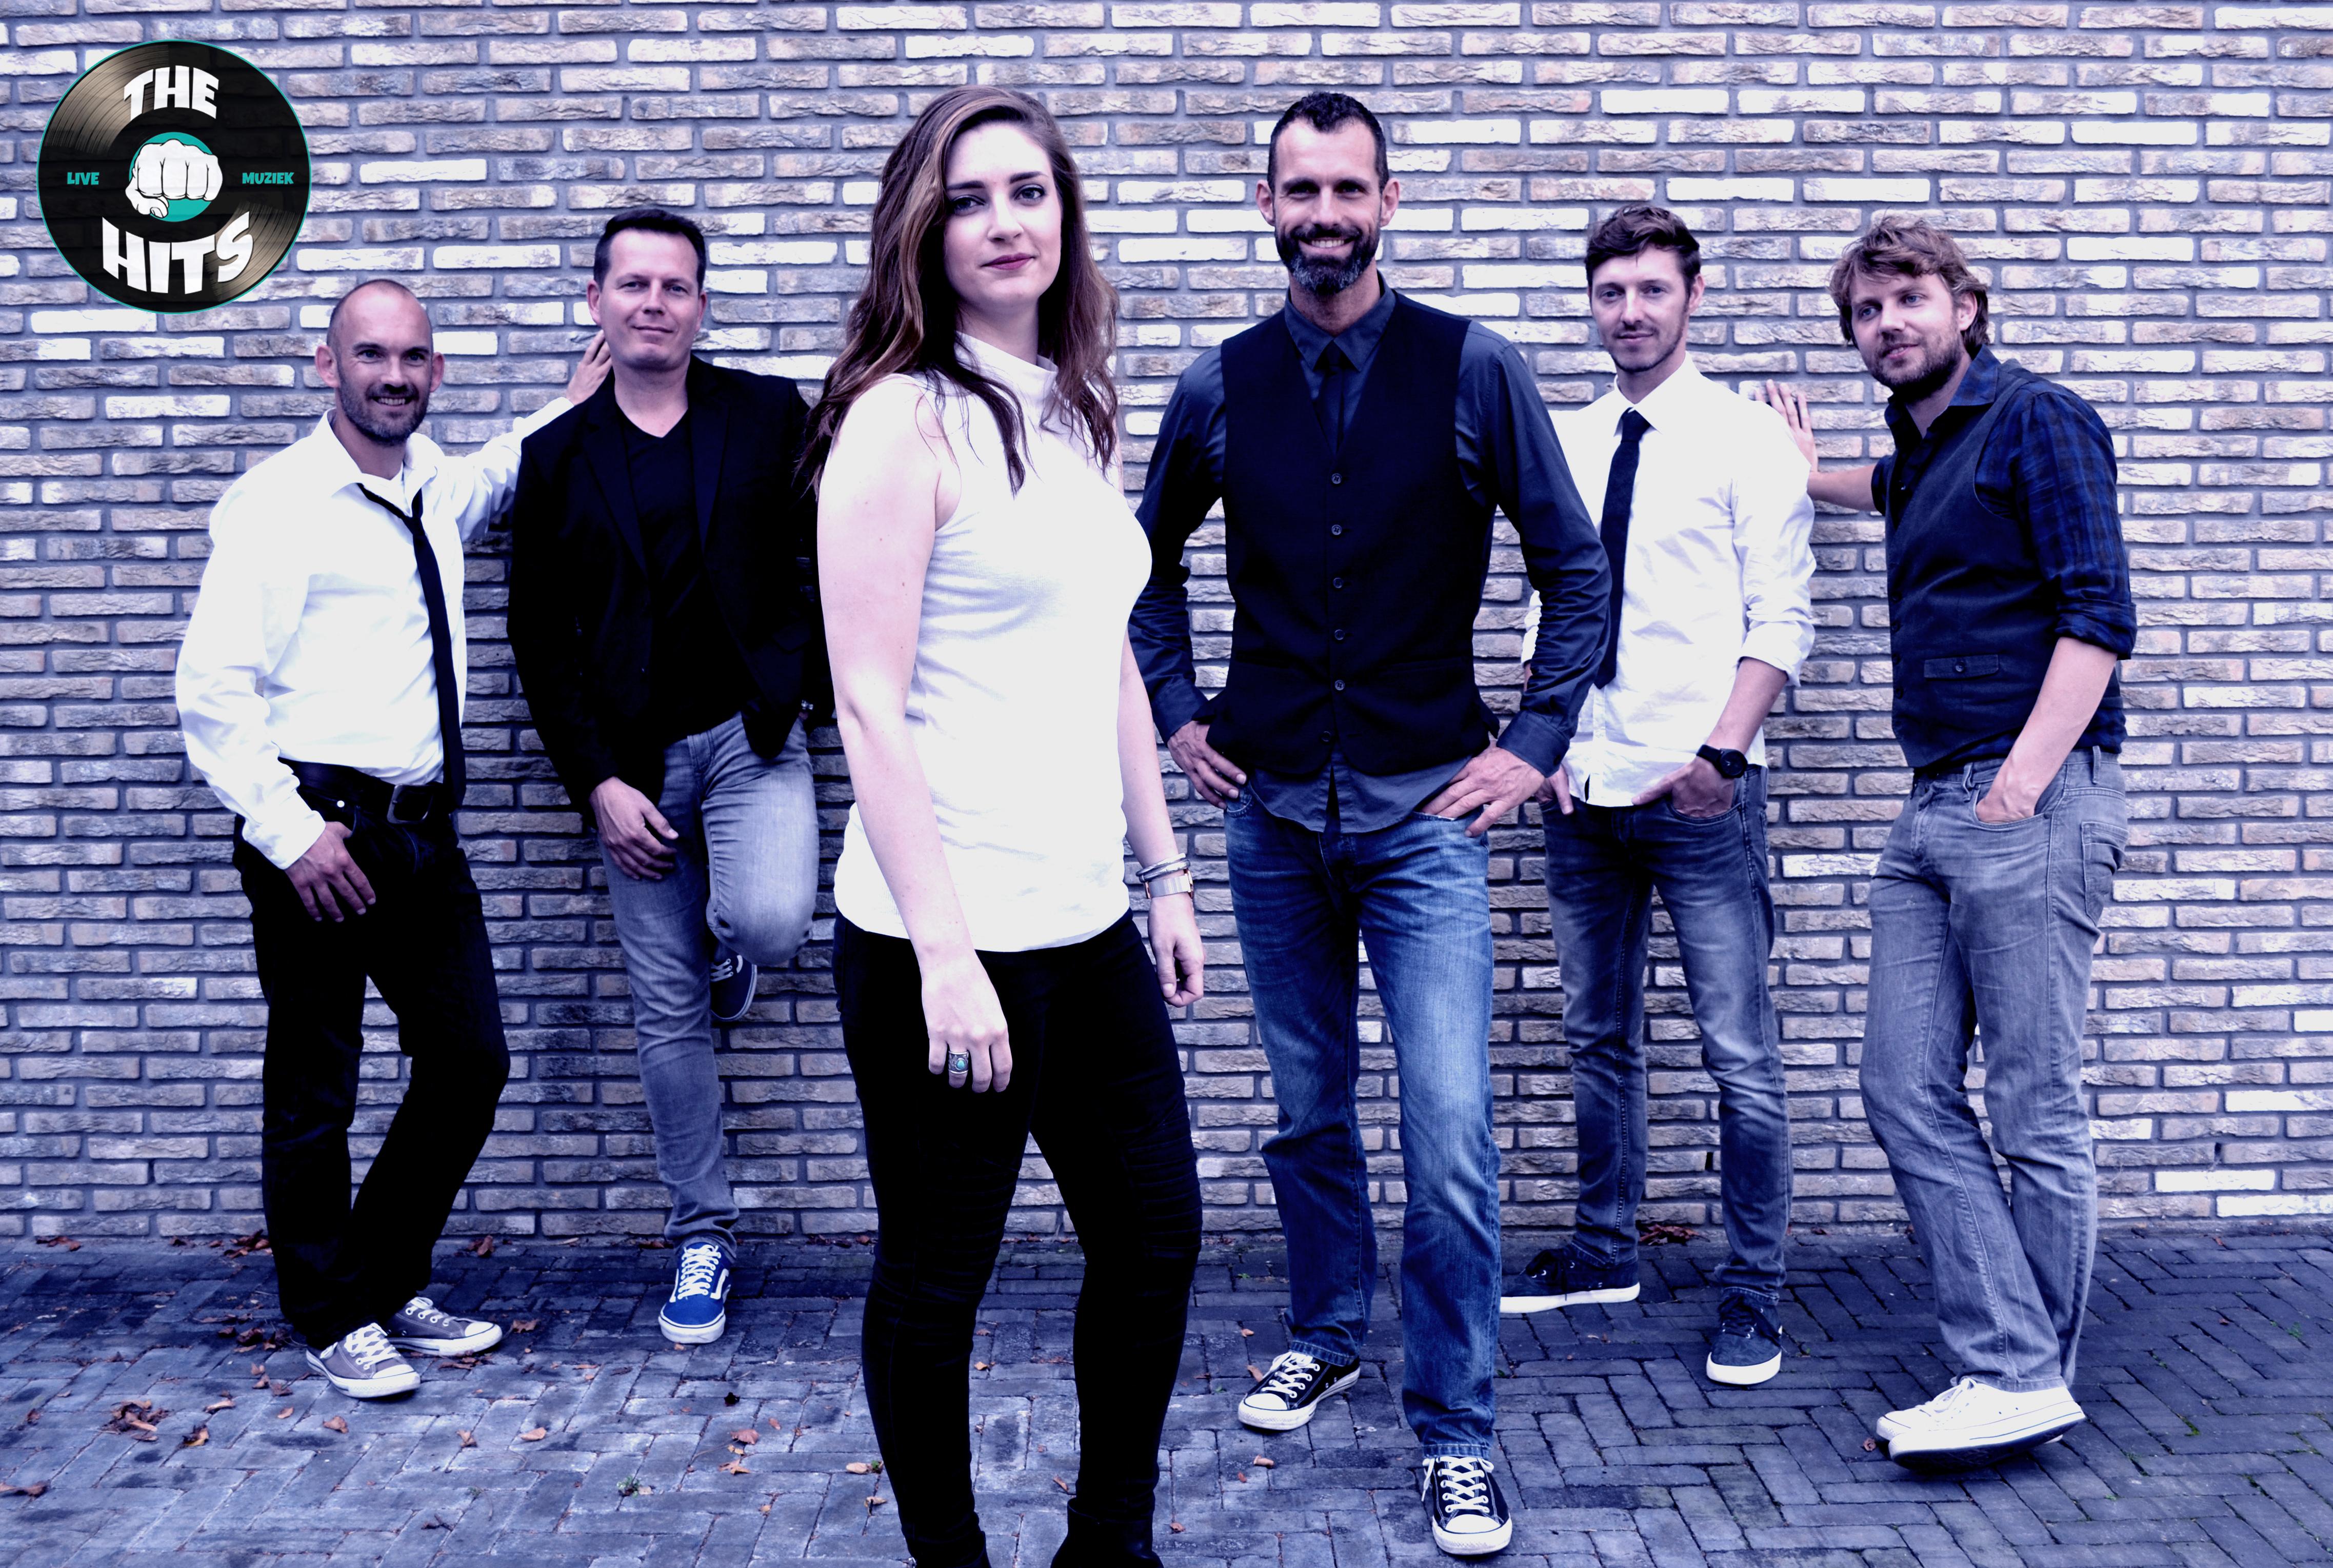 The Hits met v.l.n.r. Laurens van Vliet, Martijn Koenis, Rosanne Krab, Leon Nan, Niels Bijvoet en Jeroen Mooij.